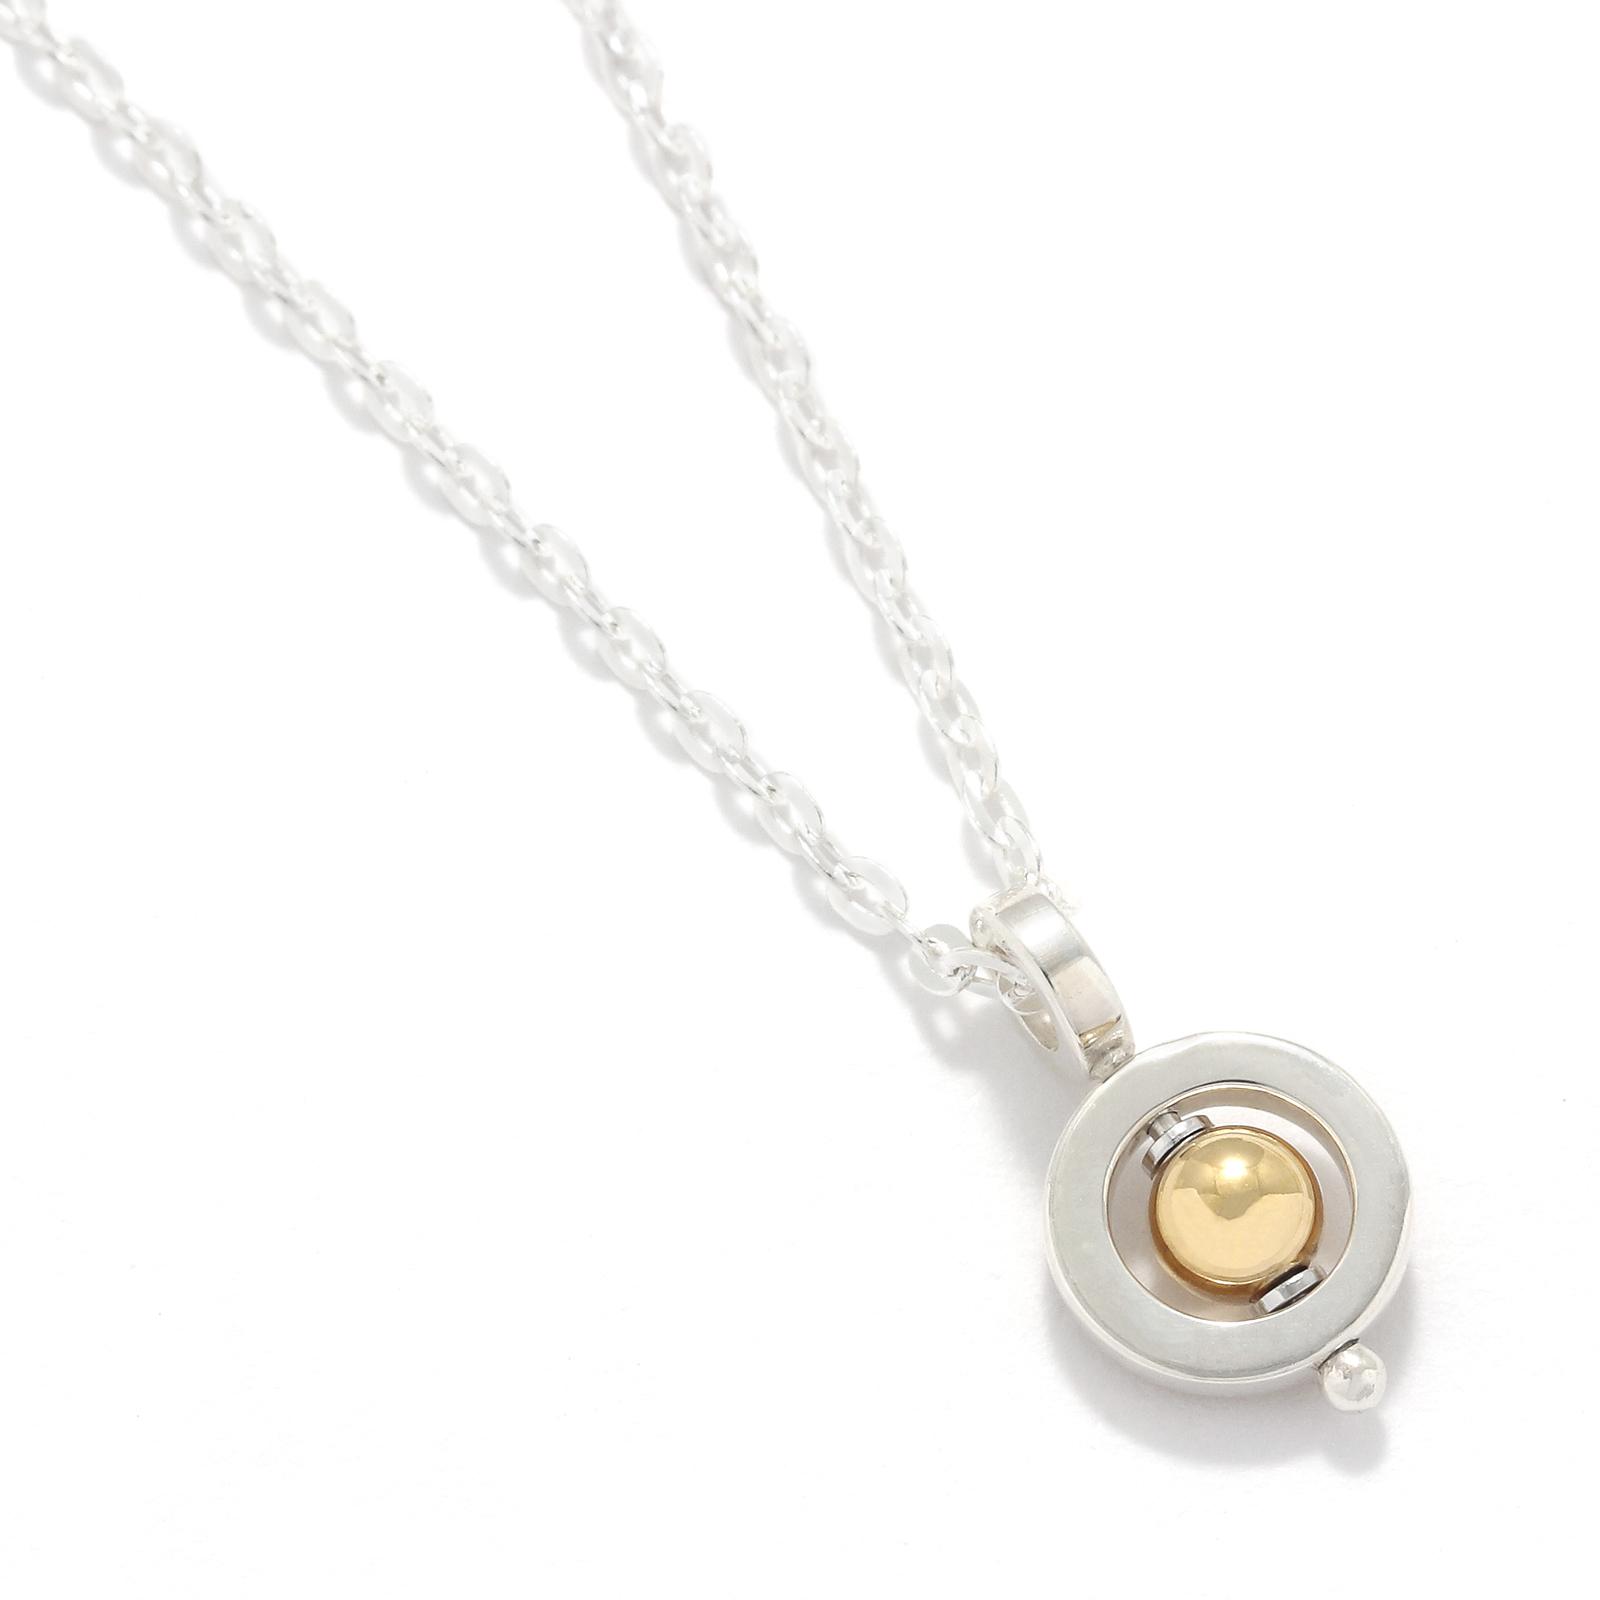 Tiny Bramanda Necklace Silver w/18K Bead